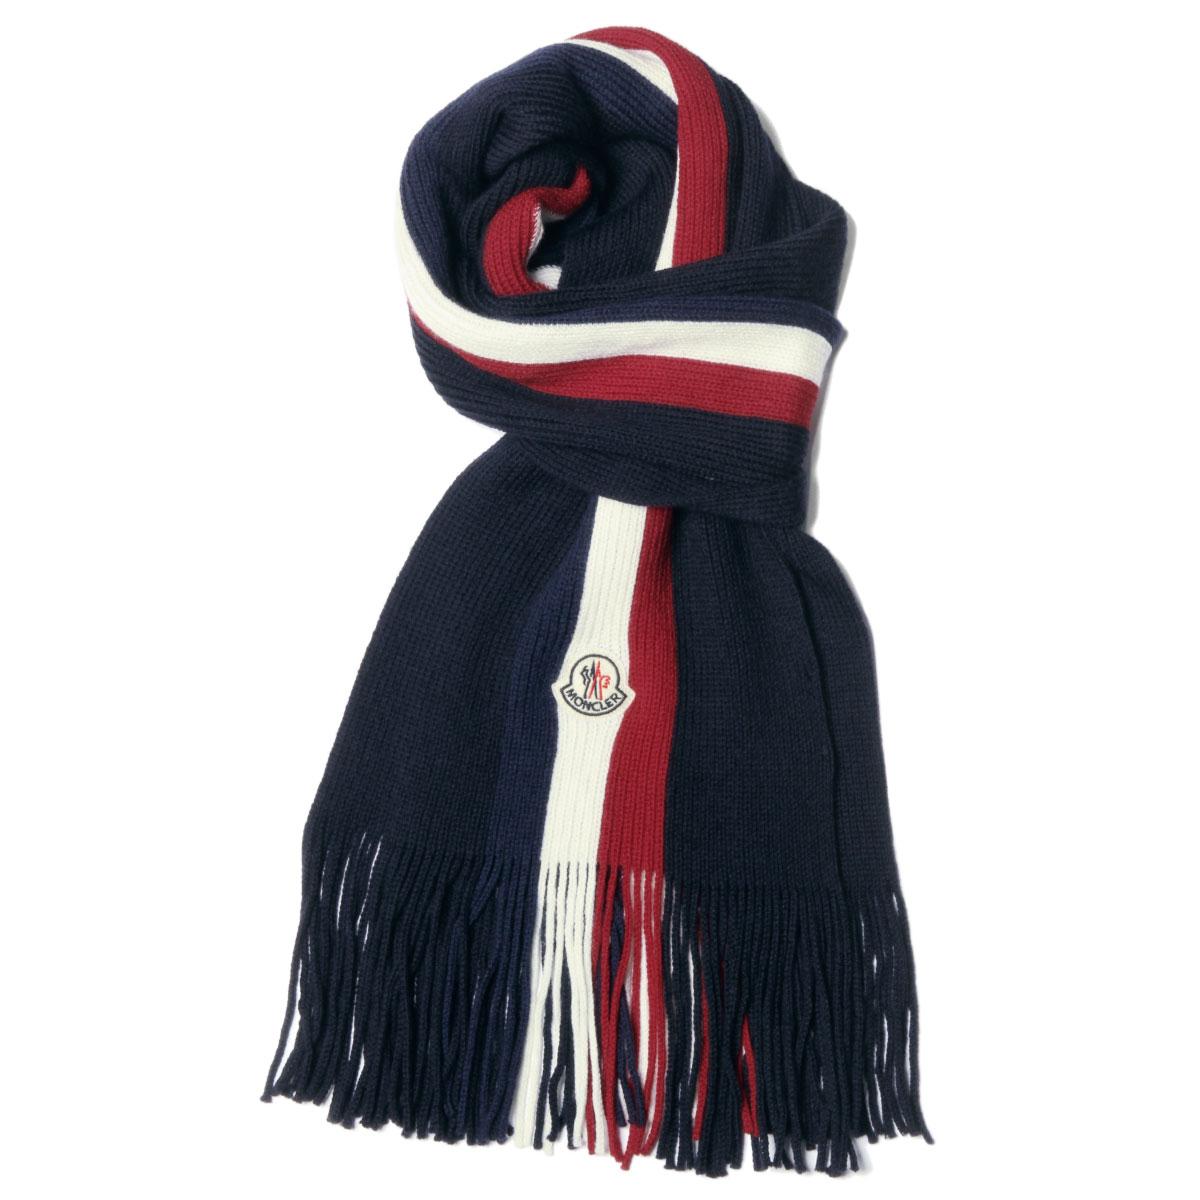 importshopdouble  0002600 Monk rail MONCLER scarf men 02292 742 NAVY ... eeb98c5a7a3